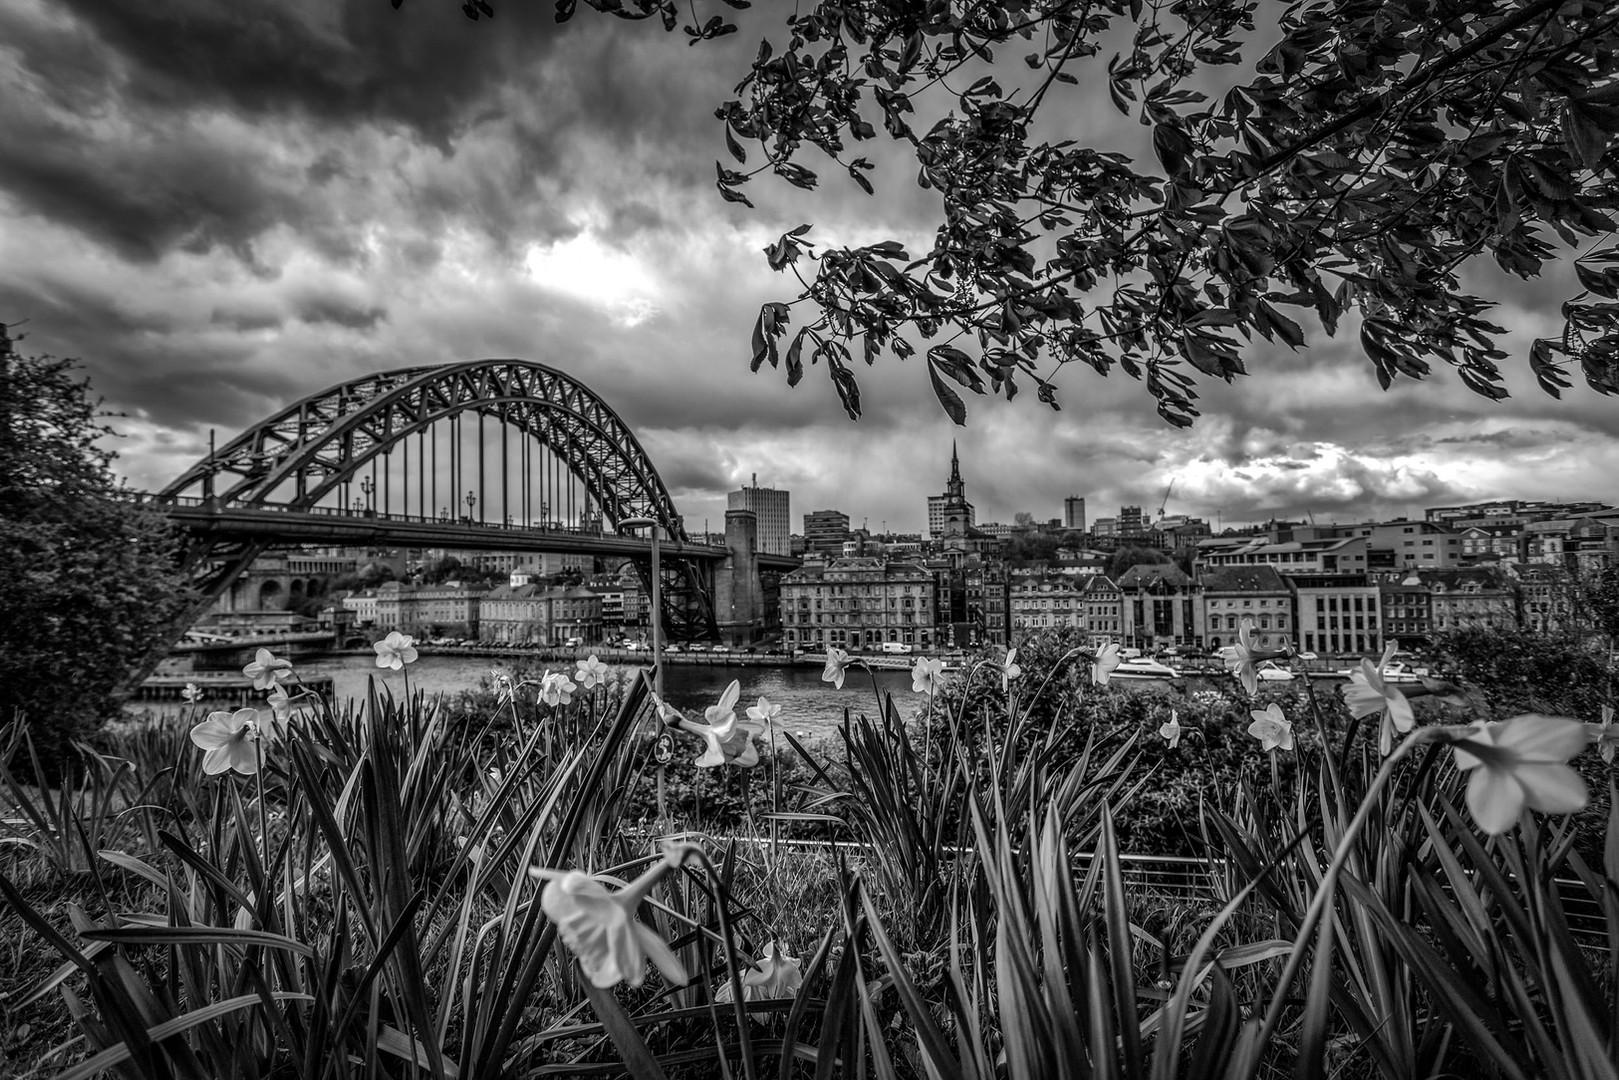 Newcastle B&W landscape